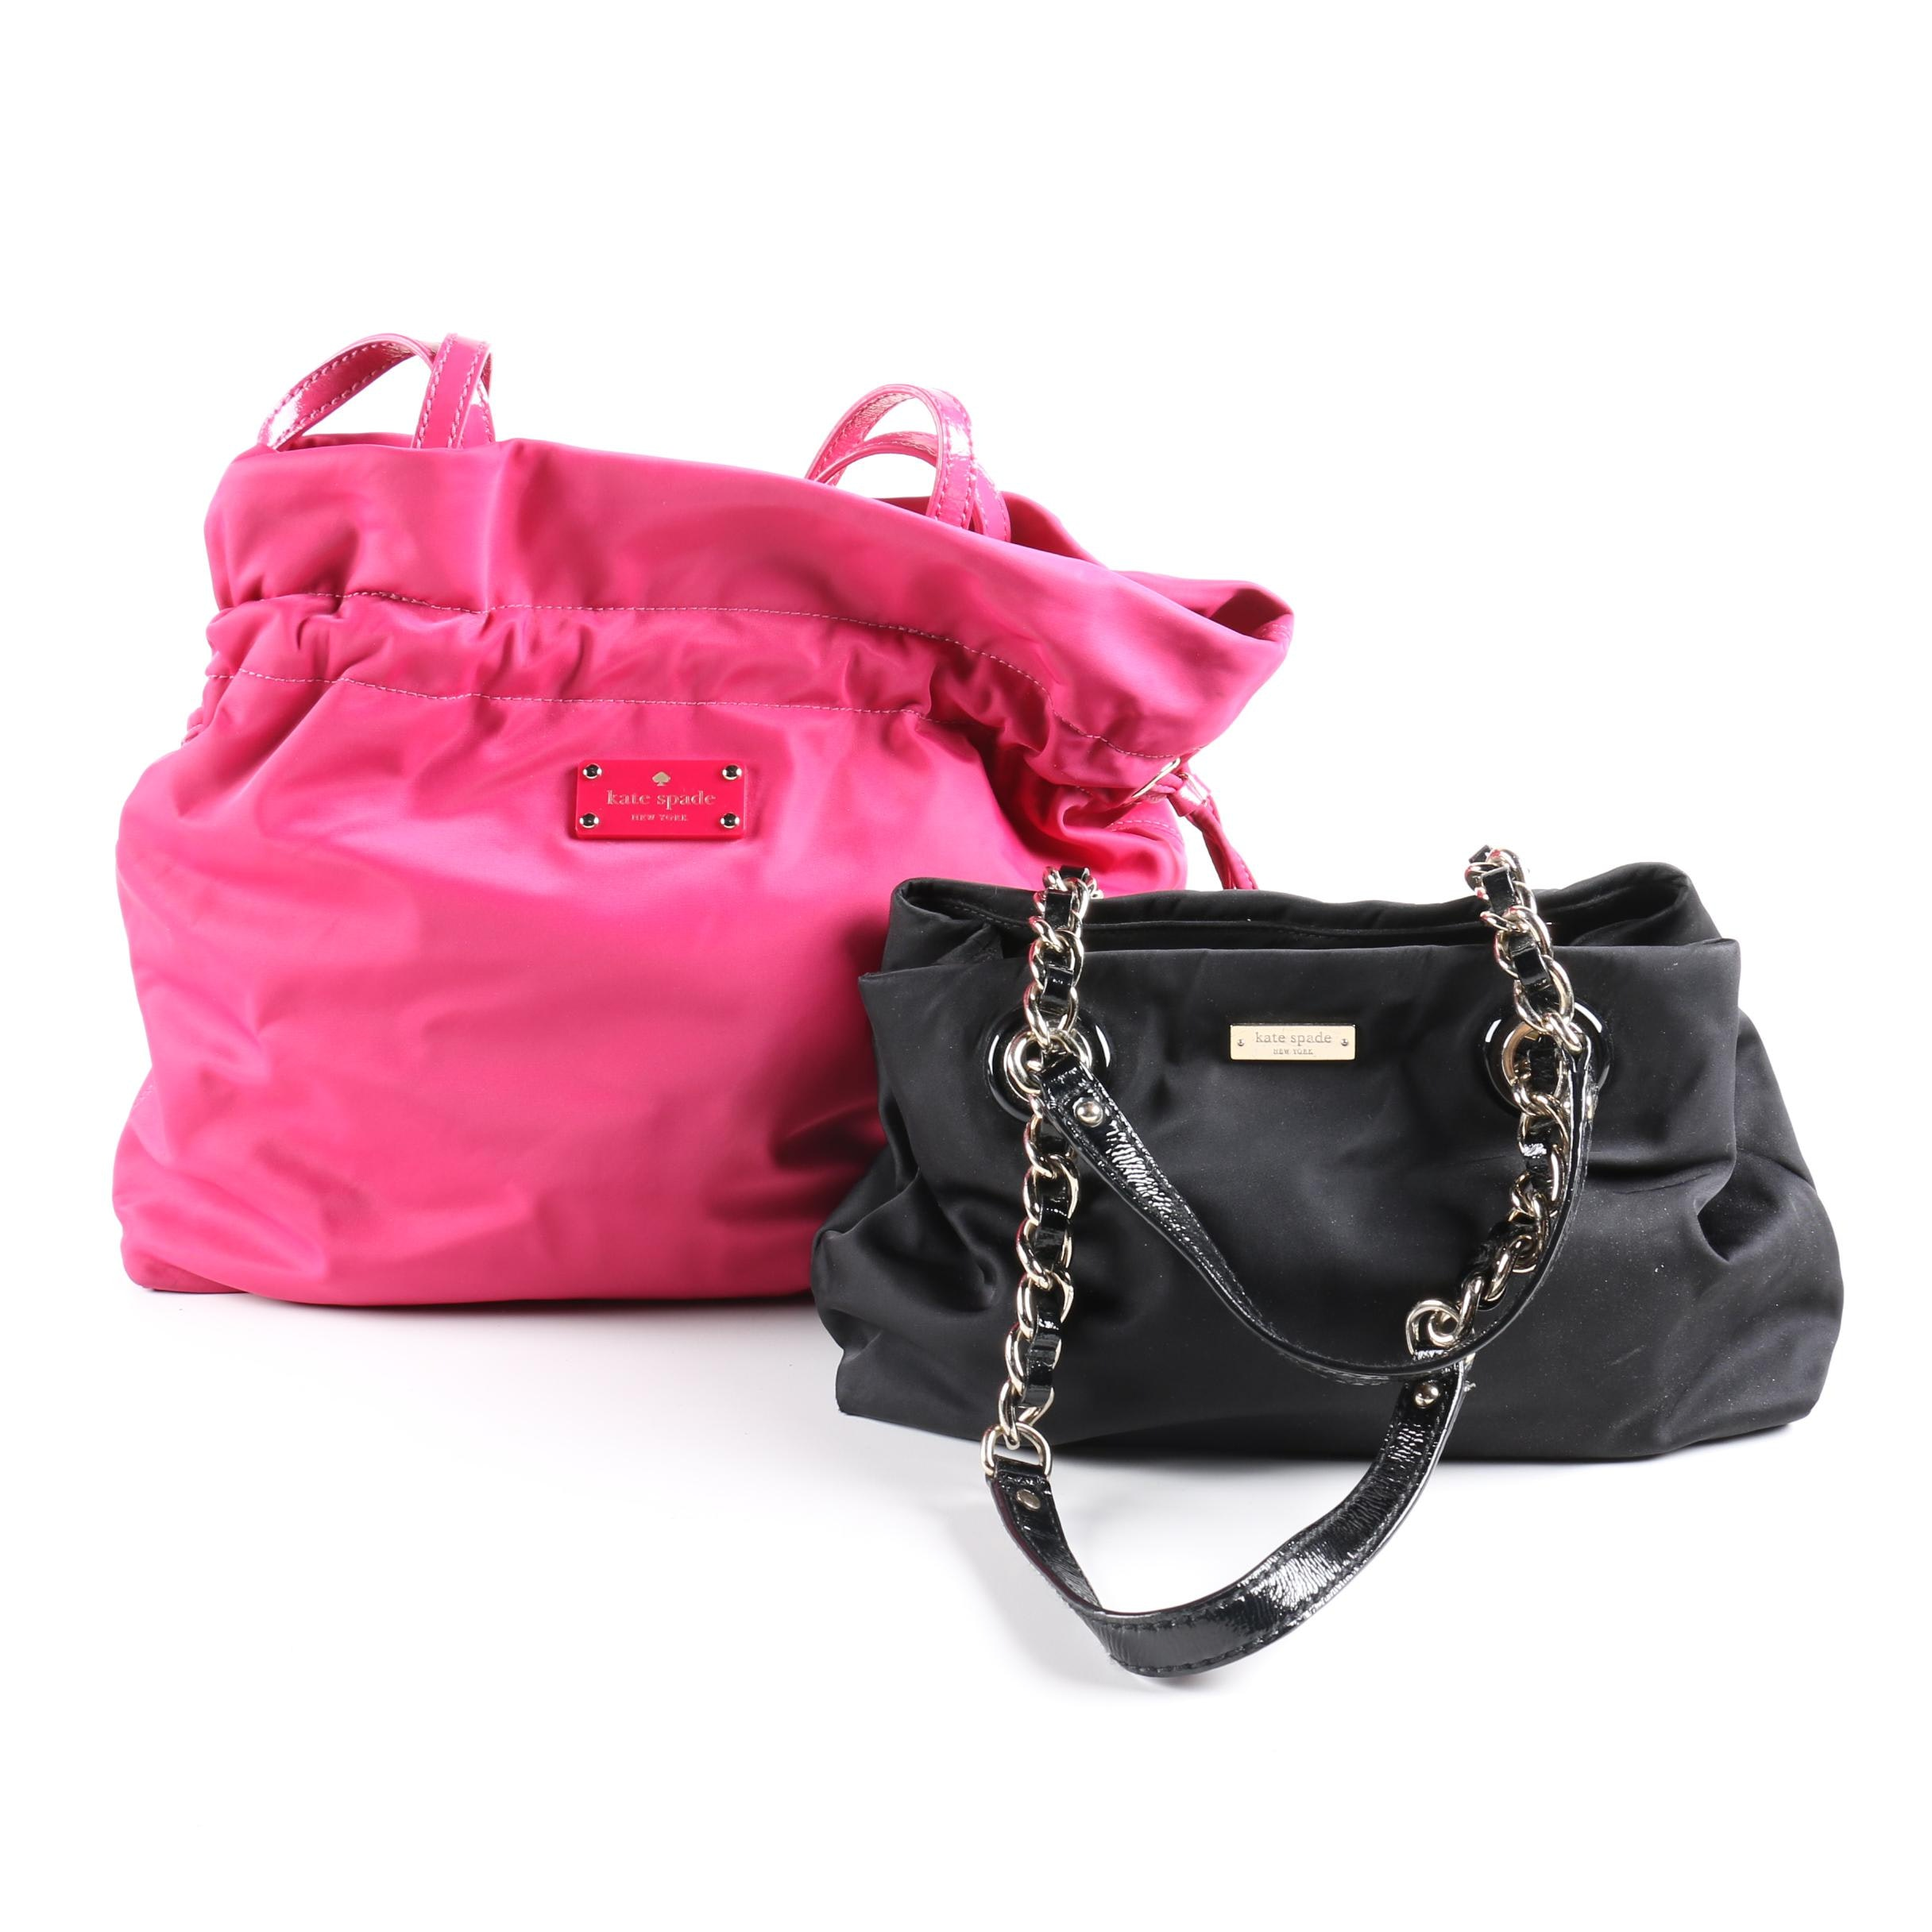 Kate Spade Nylon Shoulder Bags